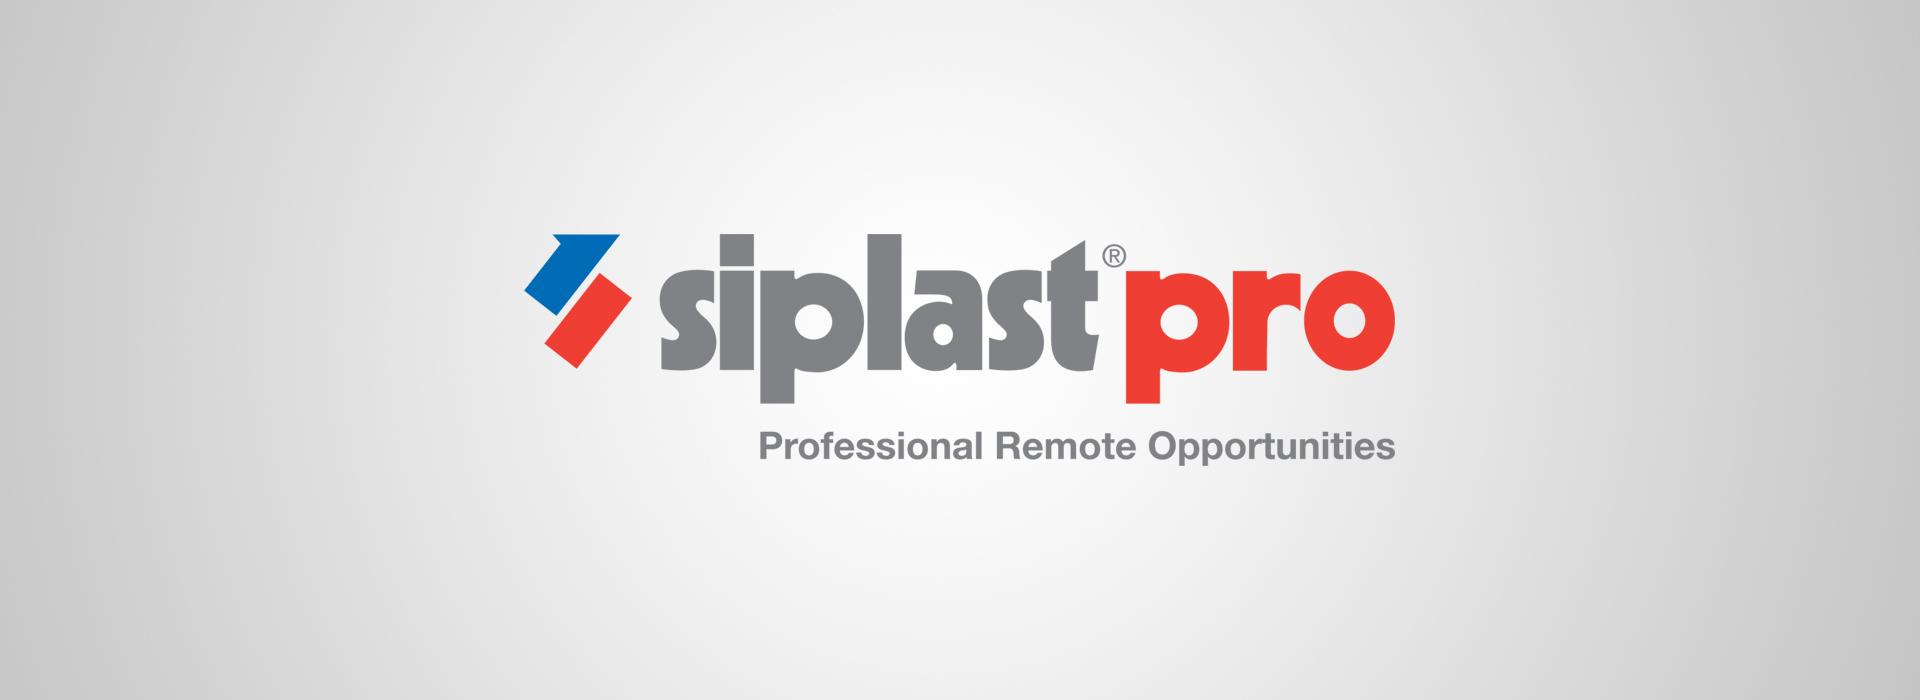 Siplast Pro